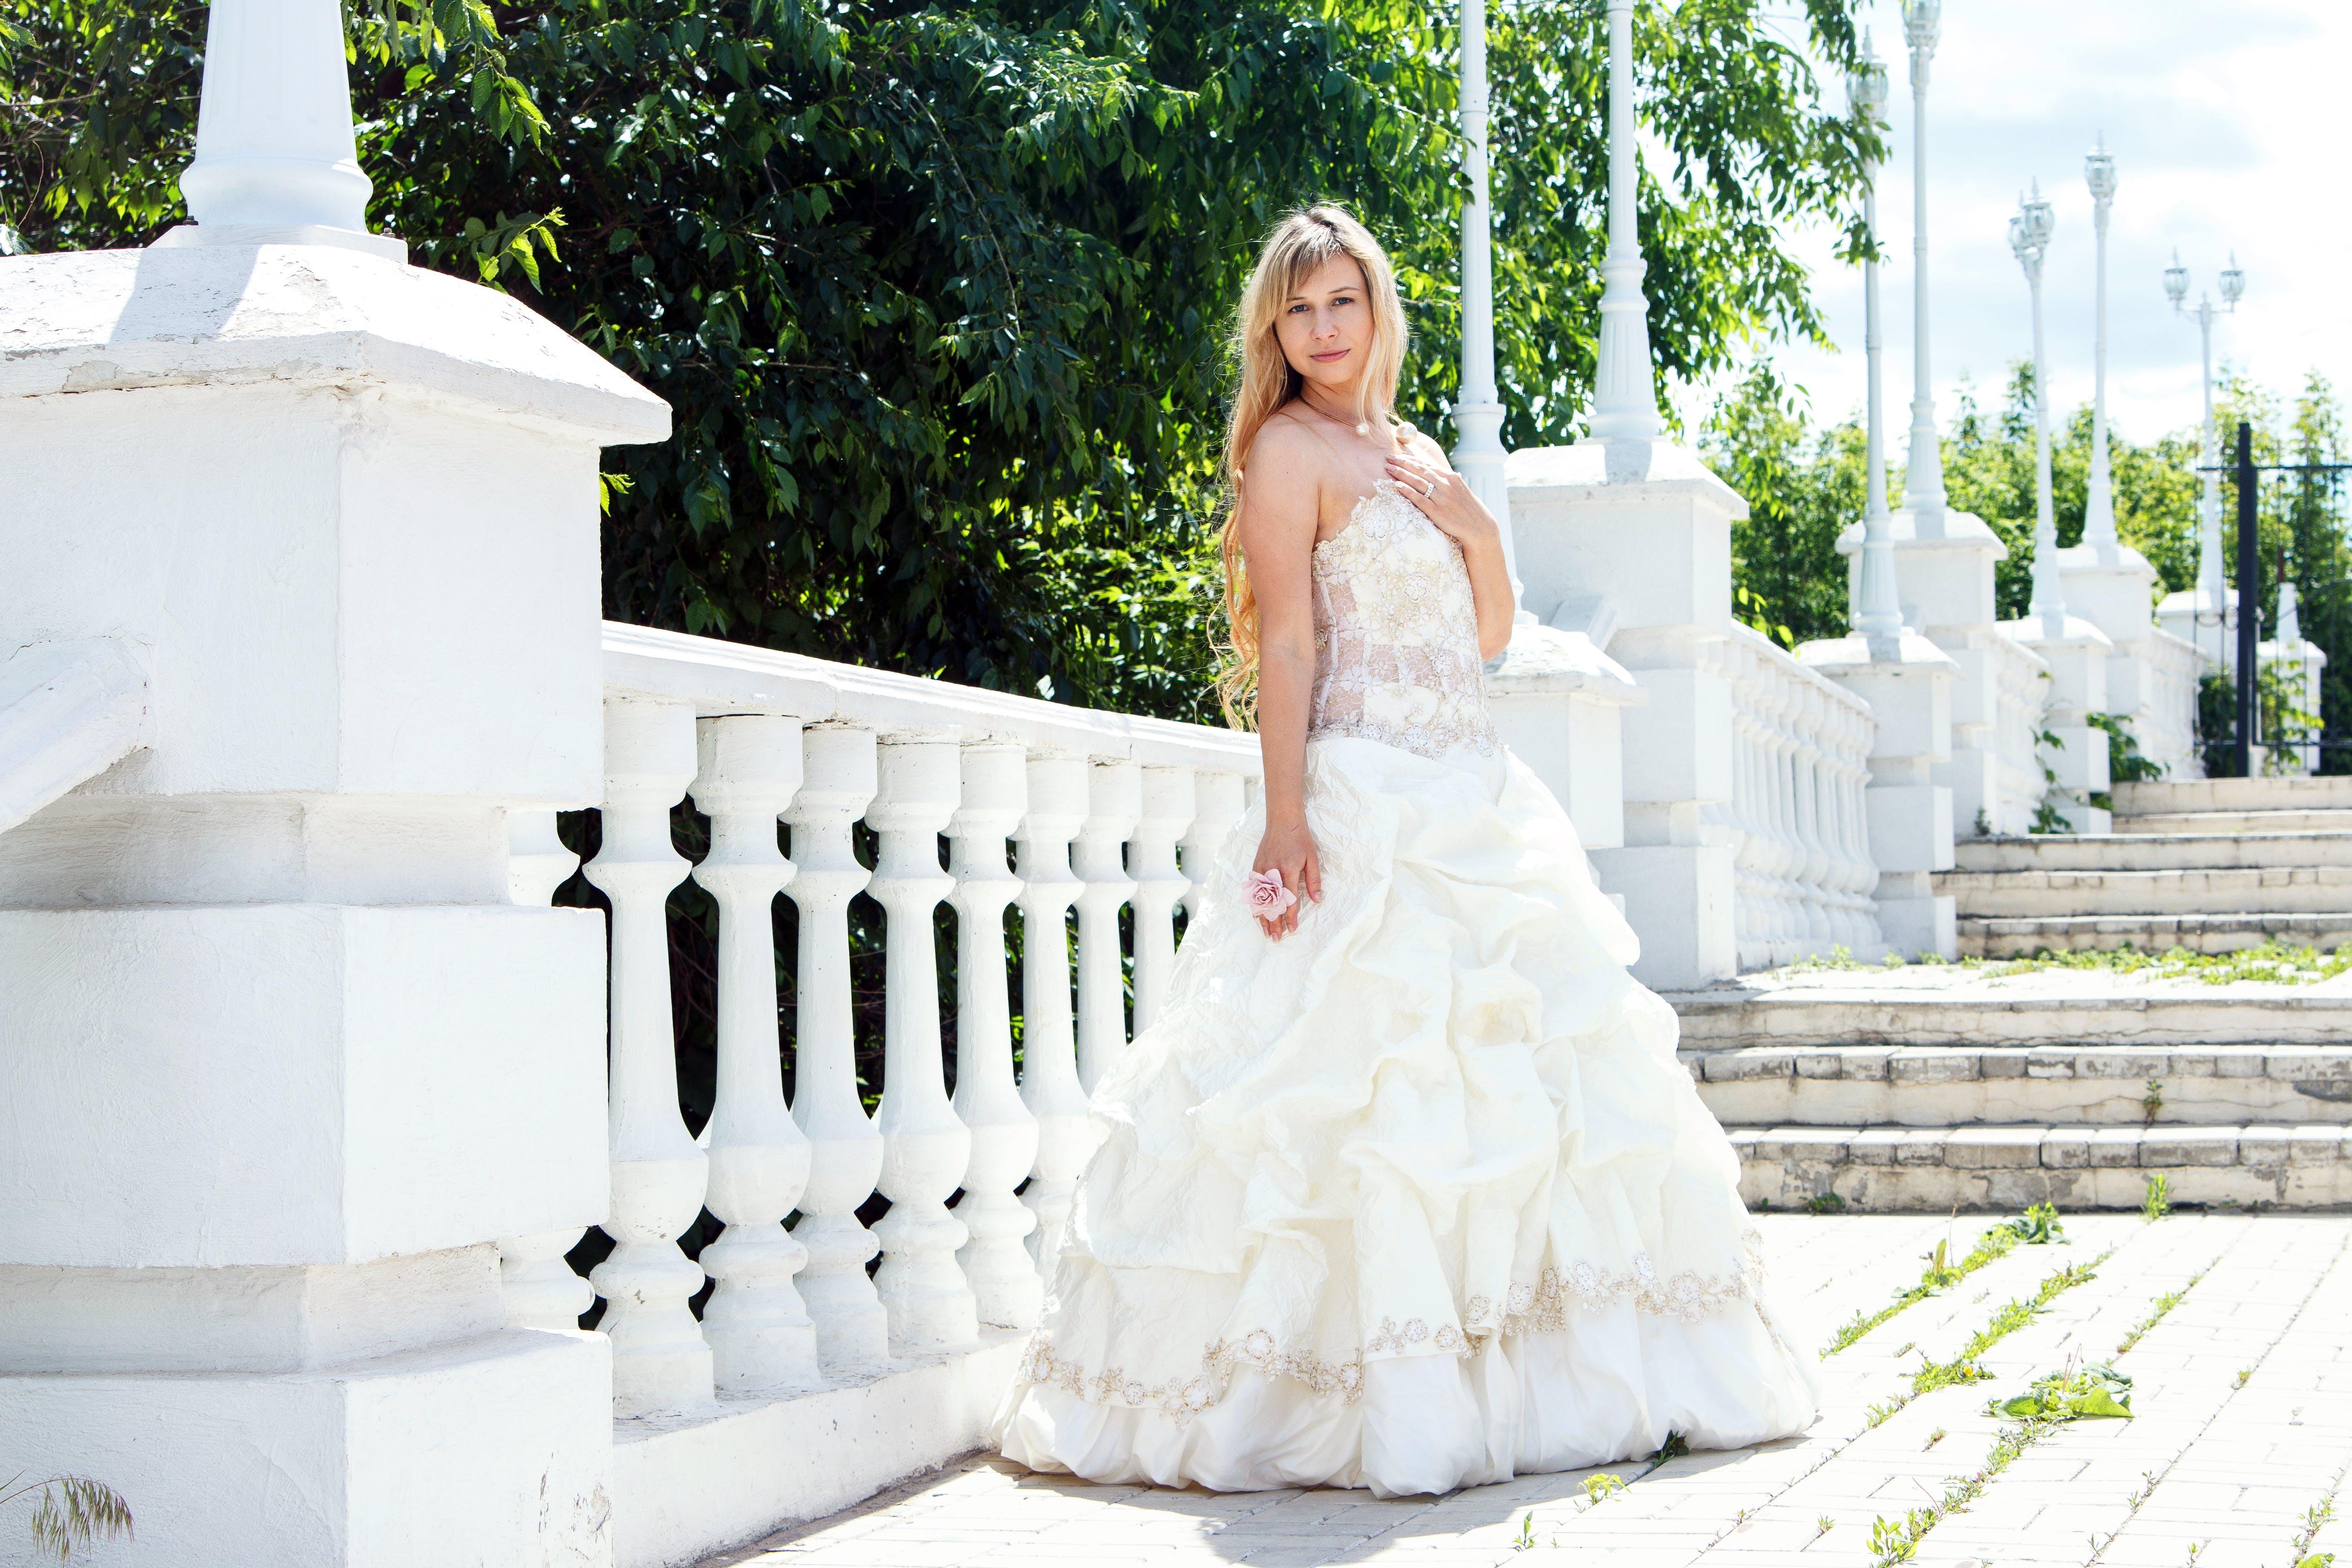 Woman Standing Wearing White Wedding Dress